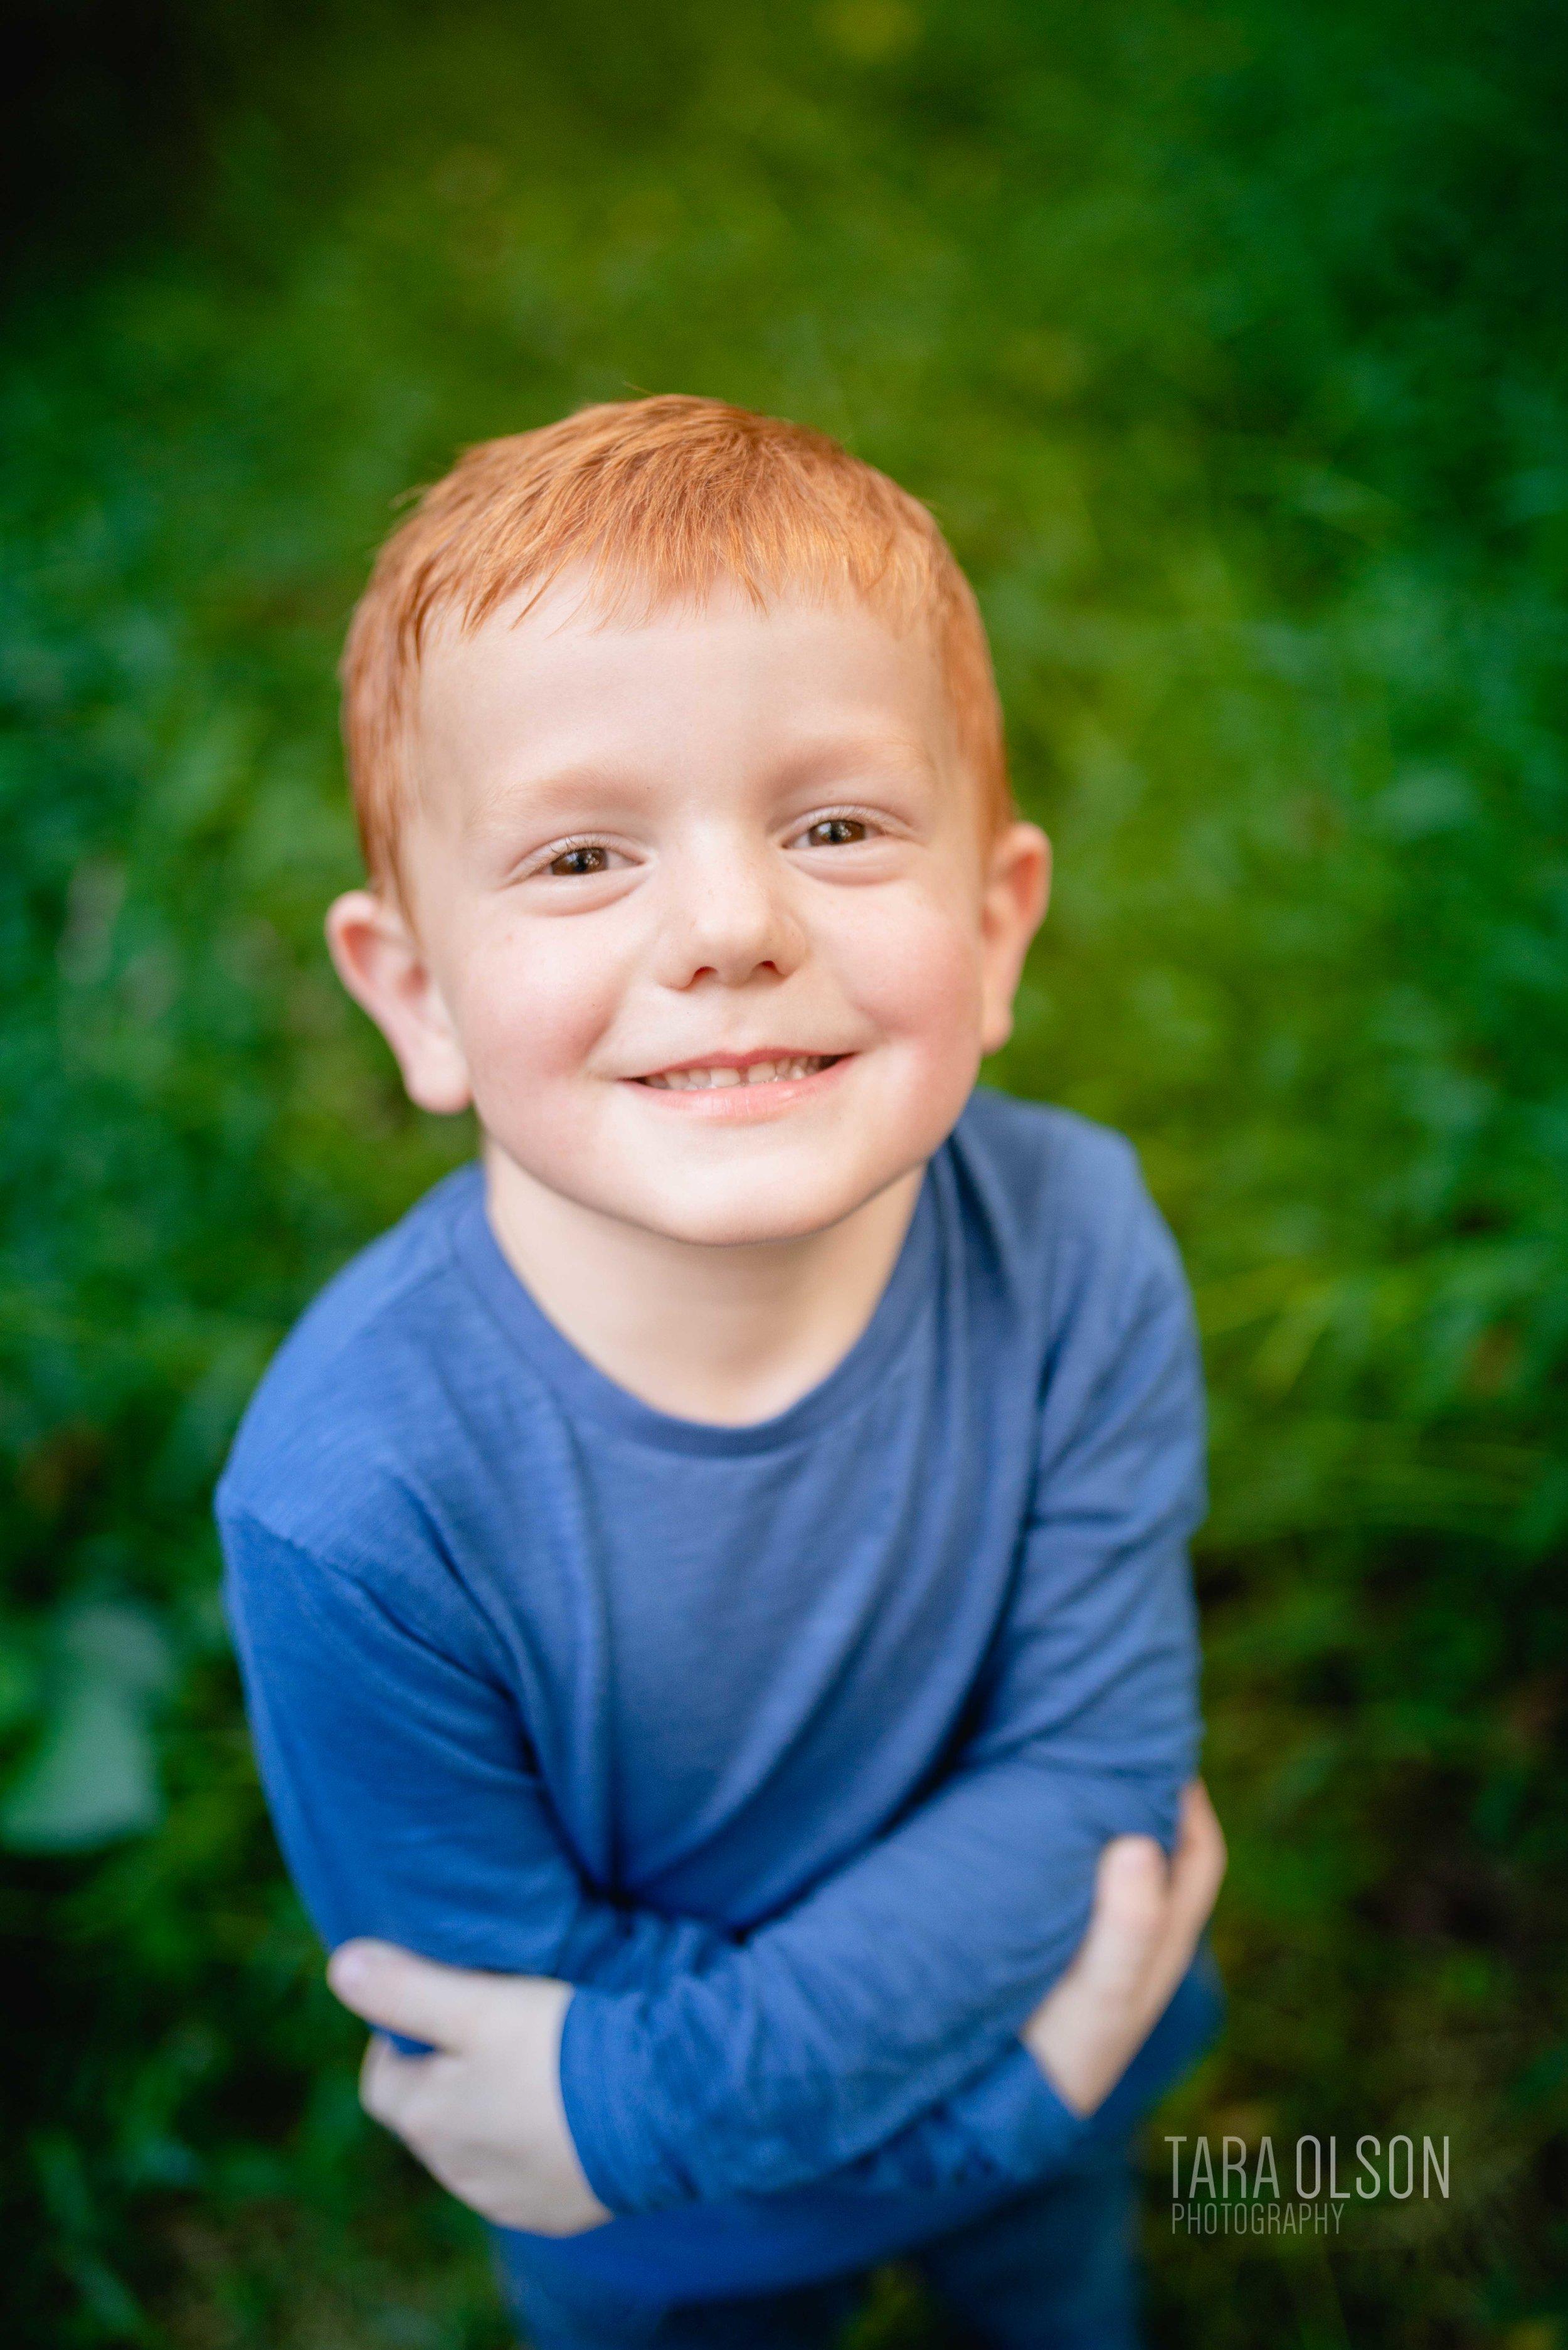 Hawkins_Arlington-Virginia-Family-Photographer_Tara-Olson-Photography_4254.jpg